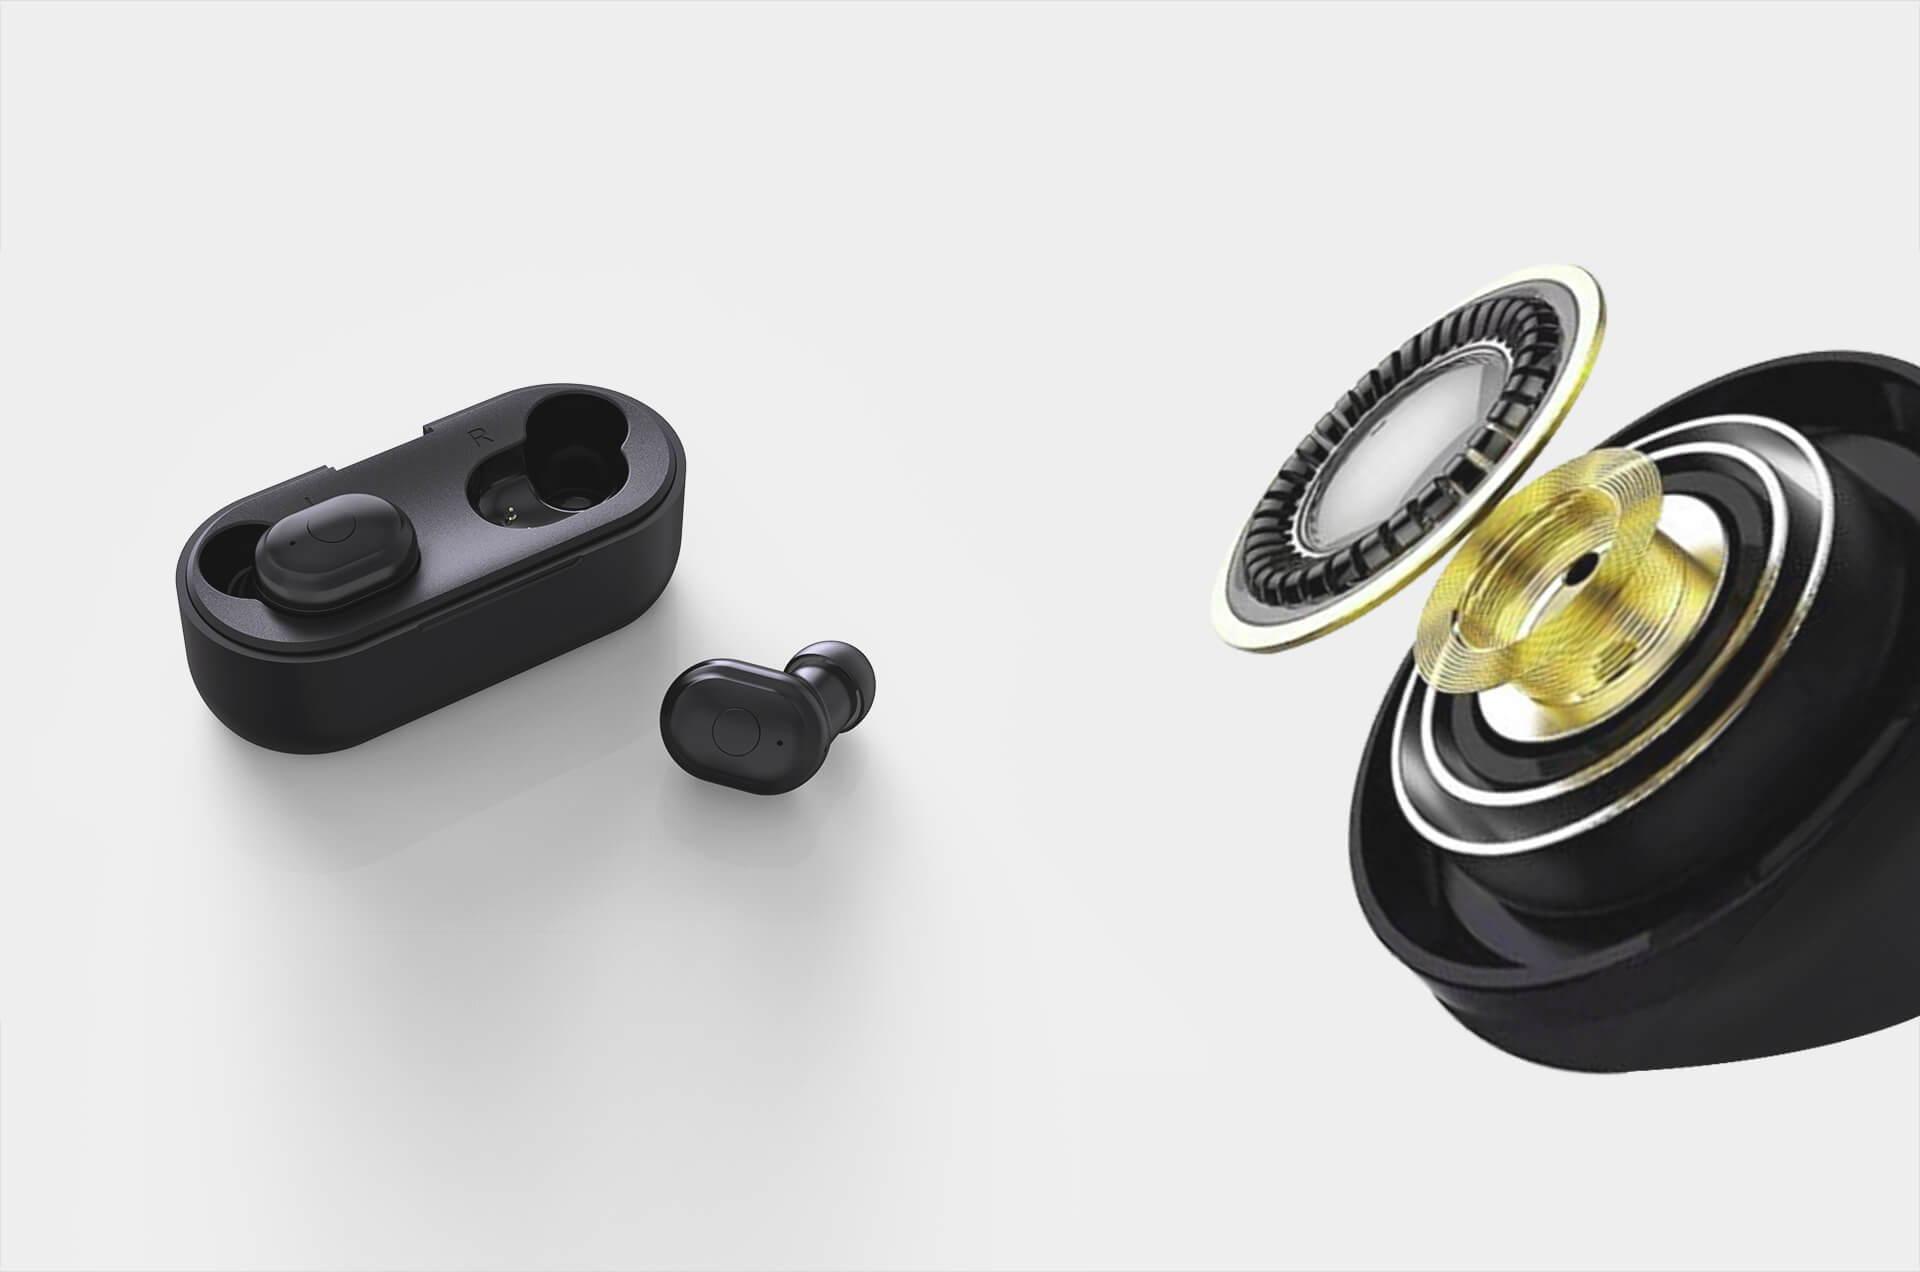 Ausdom TW01 TWS Bluetooth 5.0 Wireless Earbuds with CVC8.0 Noise Cancelling